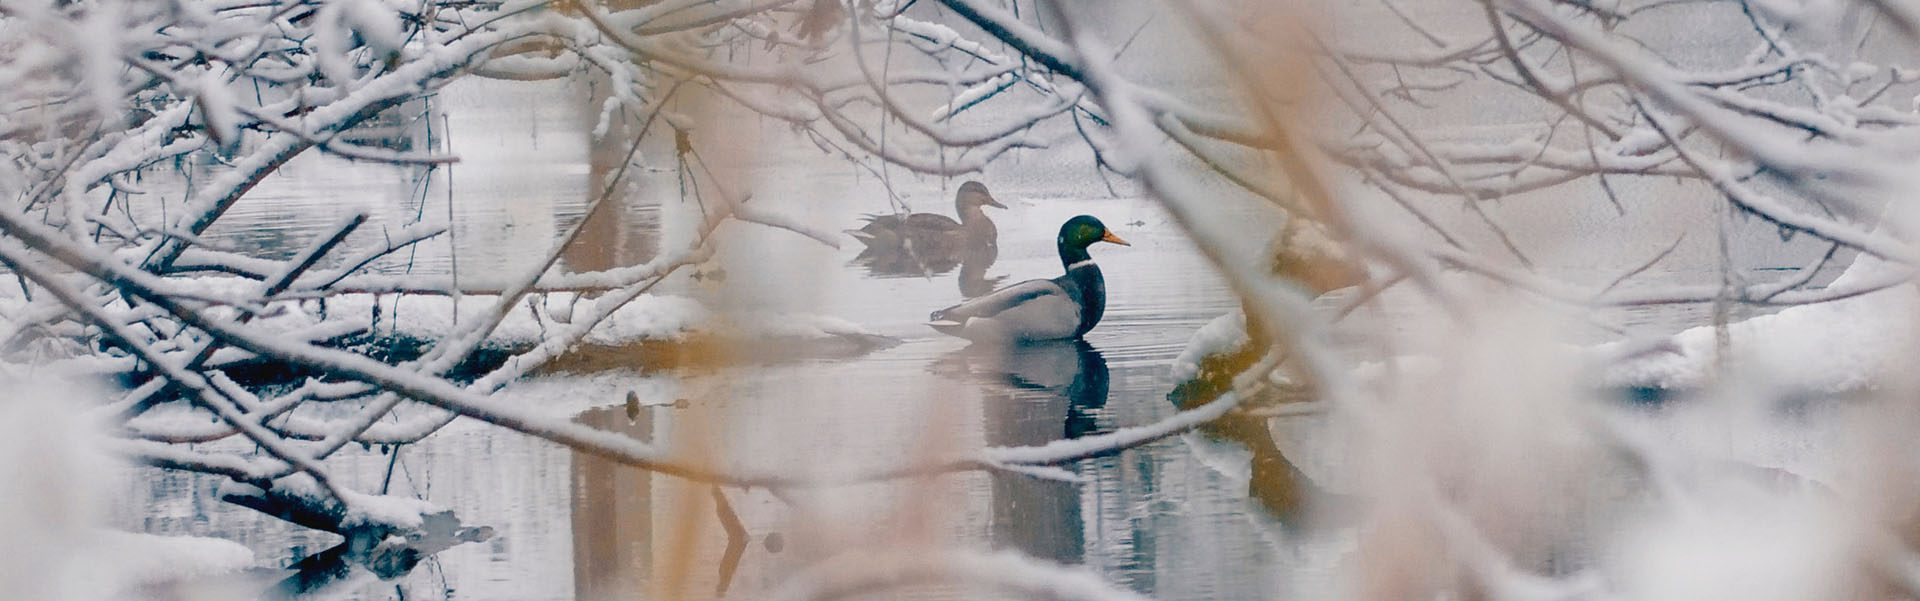 http://kingdomgames.co/memphremagog-winter-swimming-society/